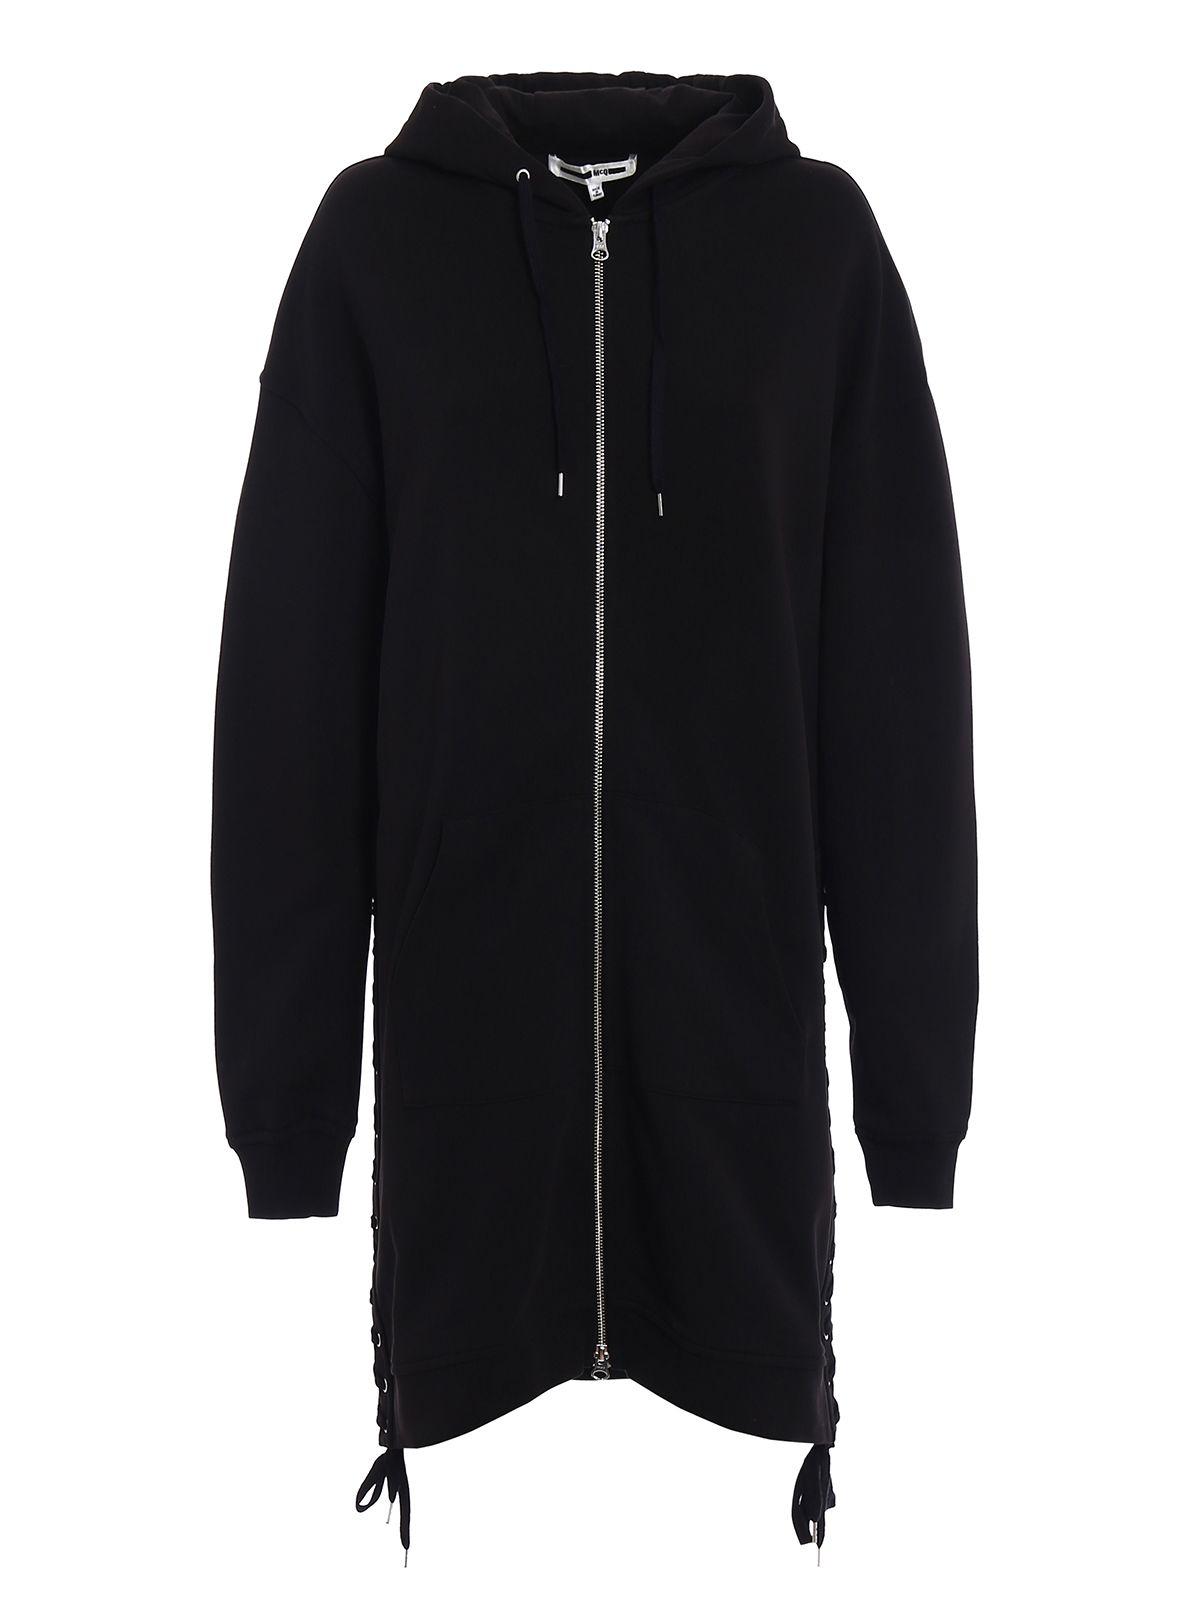 mcq by alexander mcqueen mcq alexander mcqueen long length hoodie in black modesens. Black Bedroom Furniture Sets. Home Design Ideas